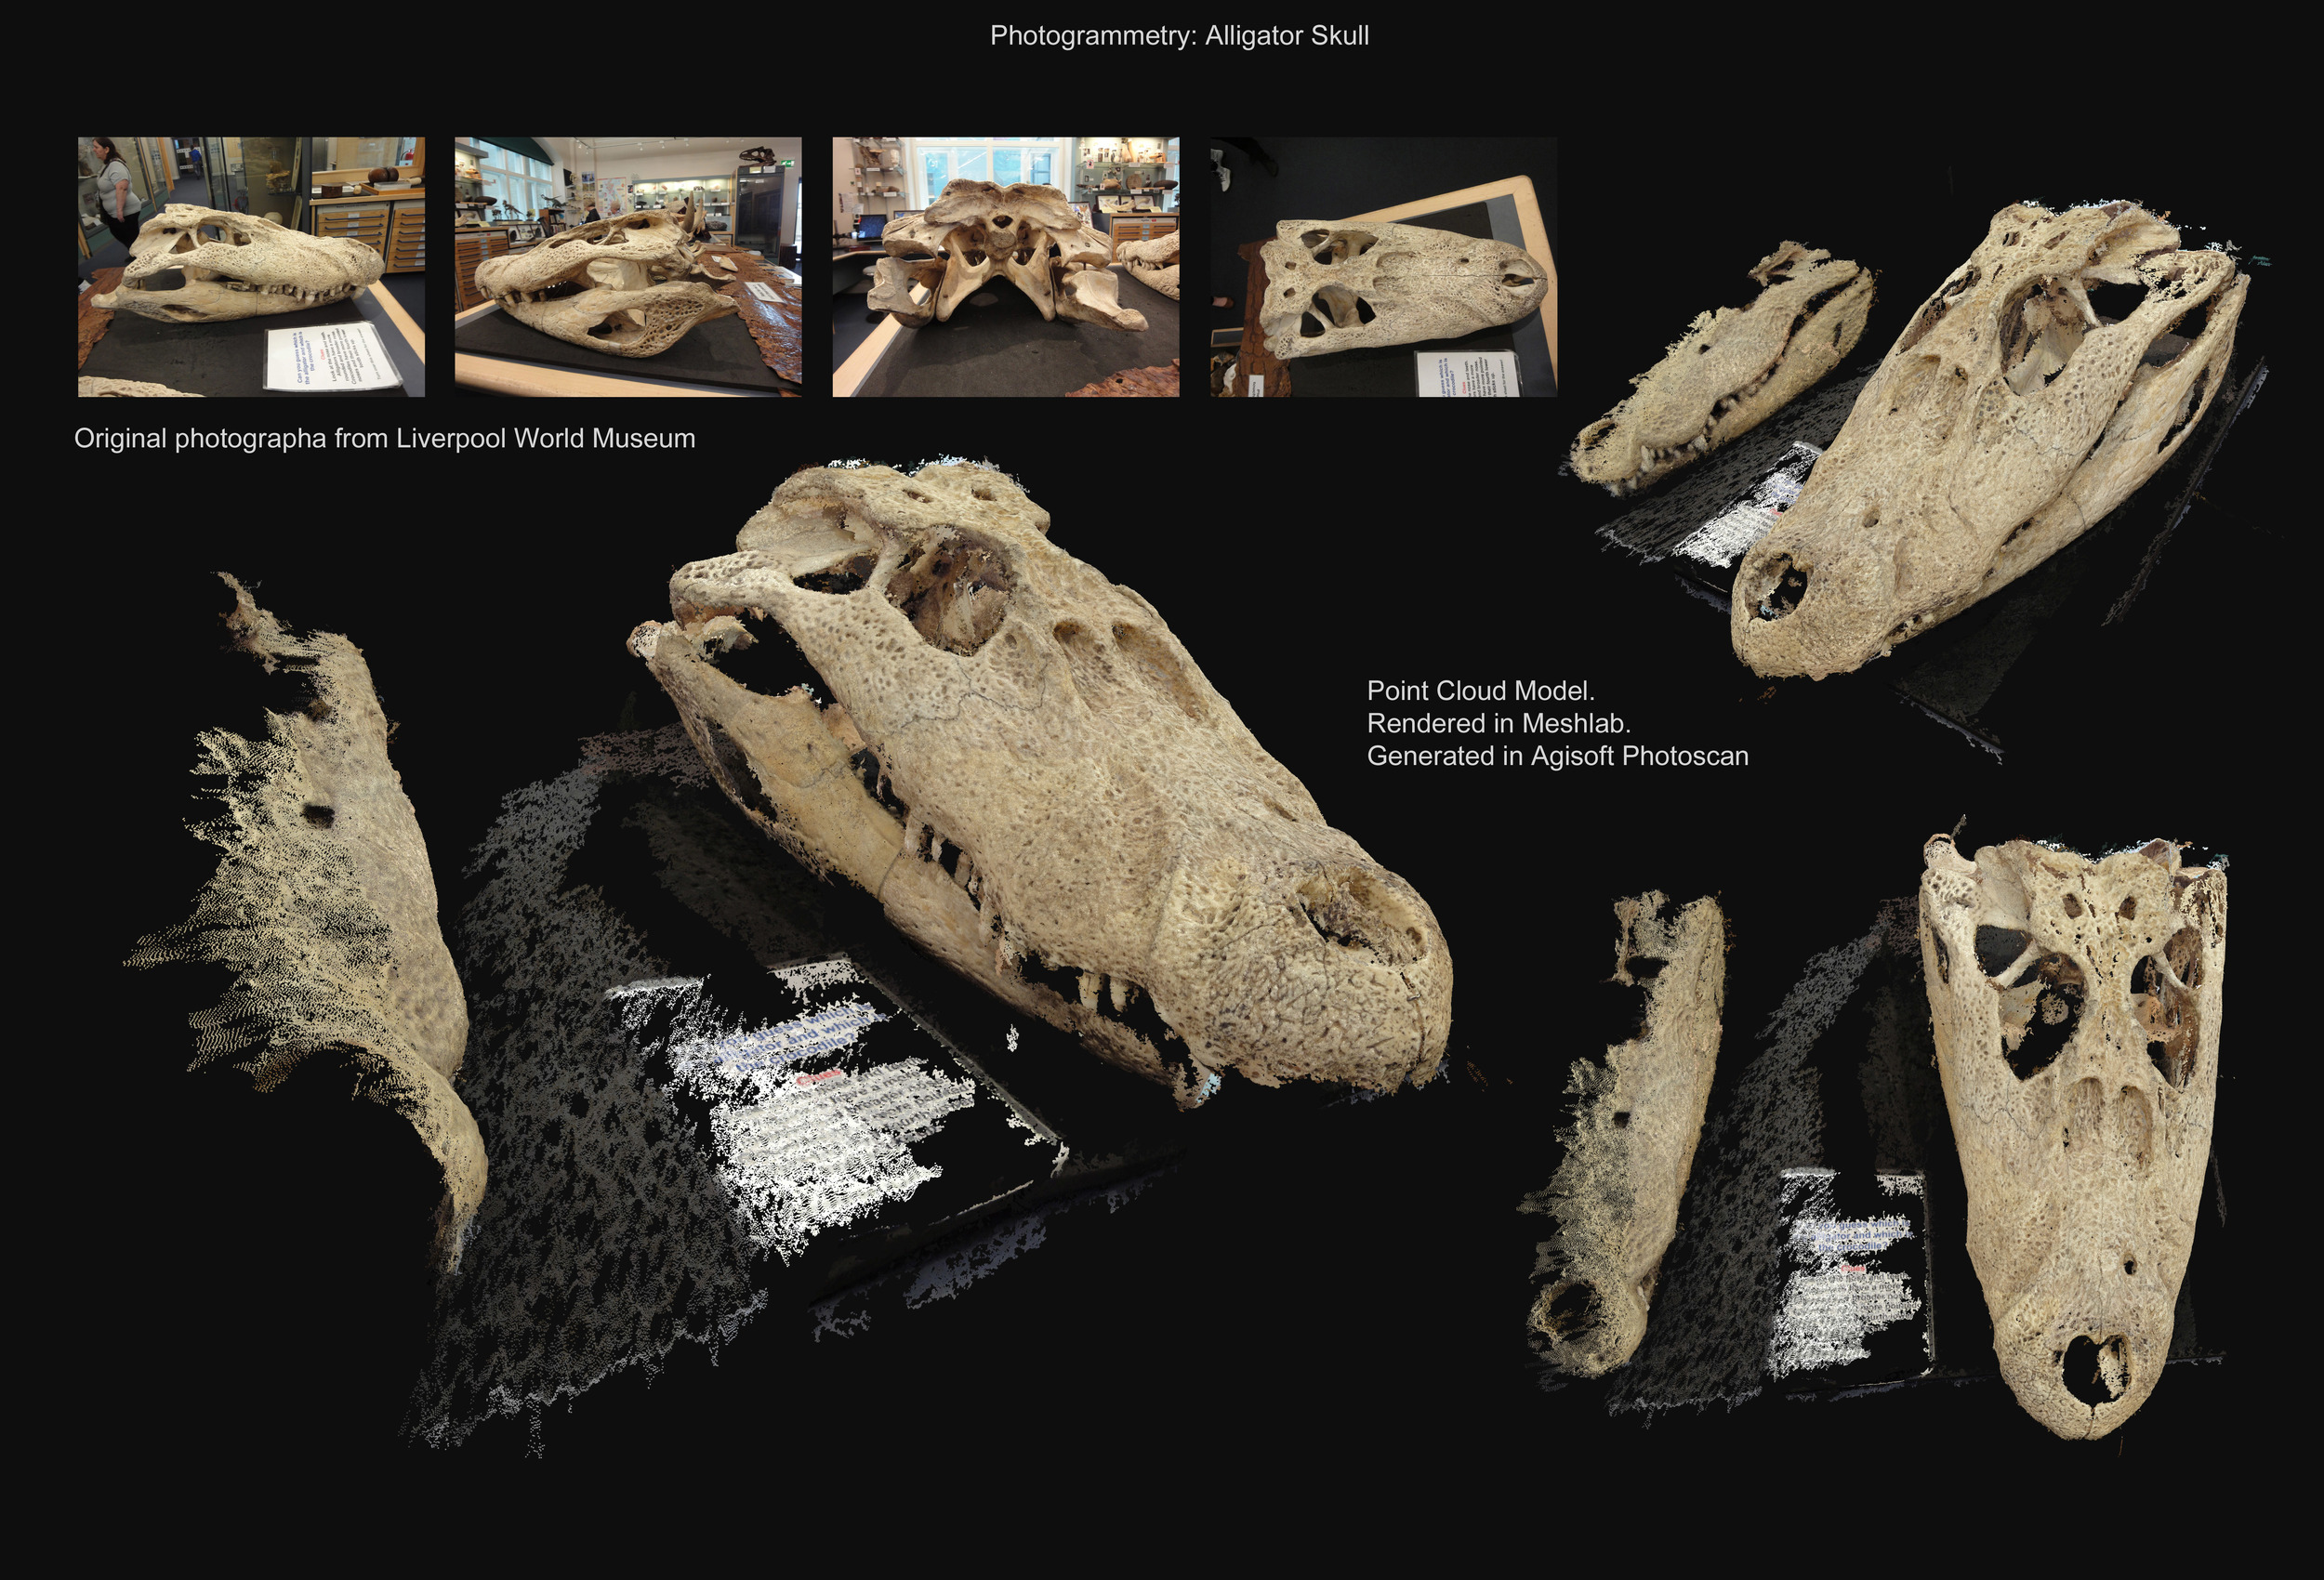 Alligator Skull - Photogrammetry - David McDonald